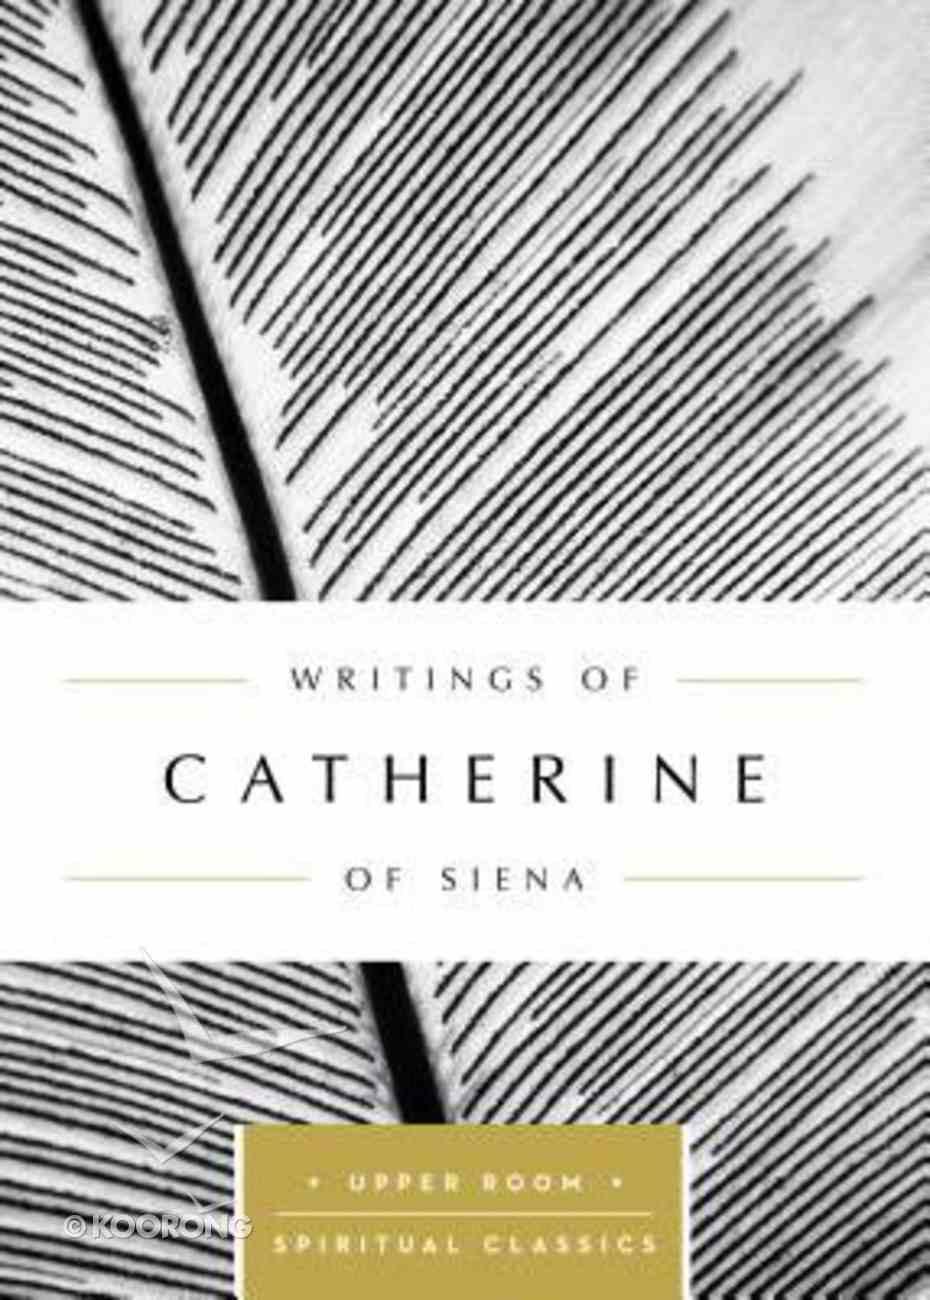 Writings of Catherine of Siena (Upper Room Spiritual Classics Series) Paperback